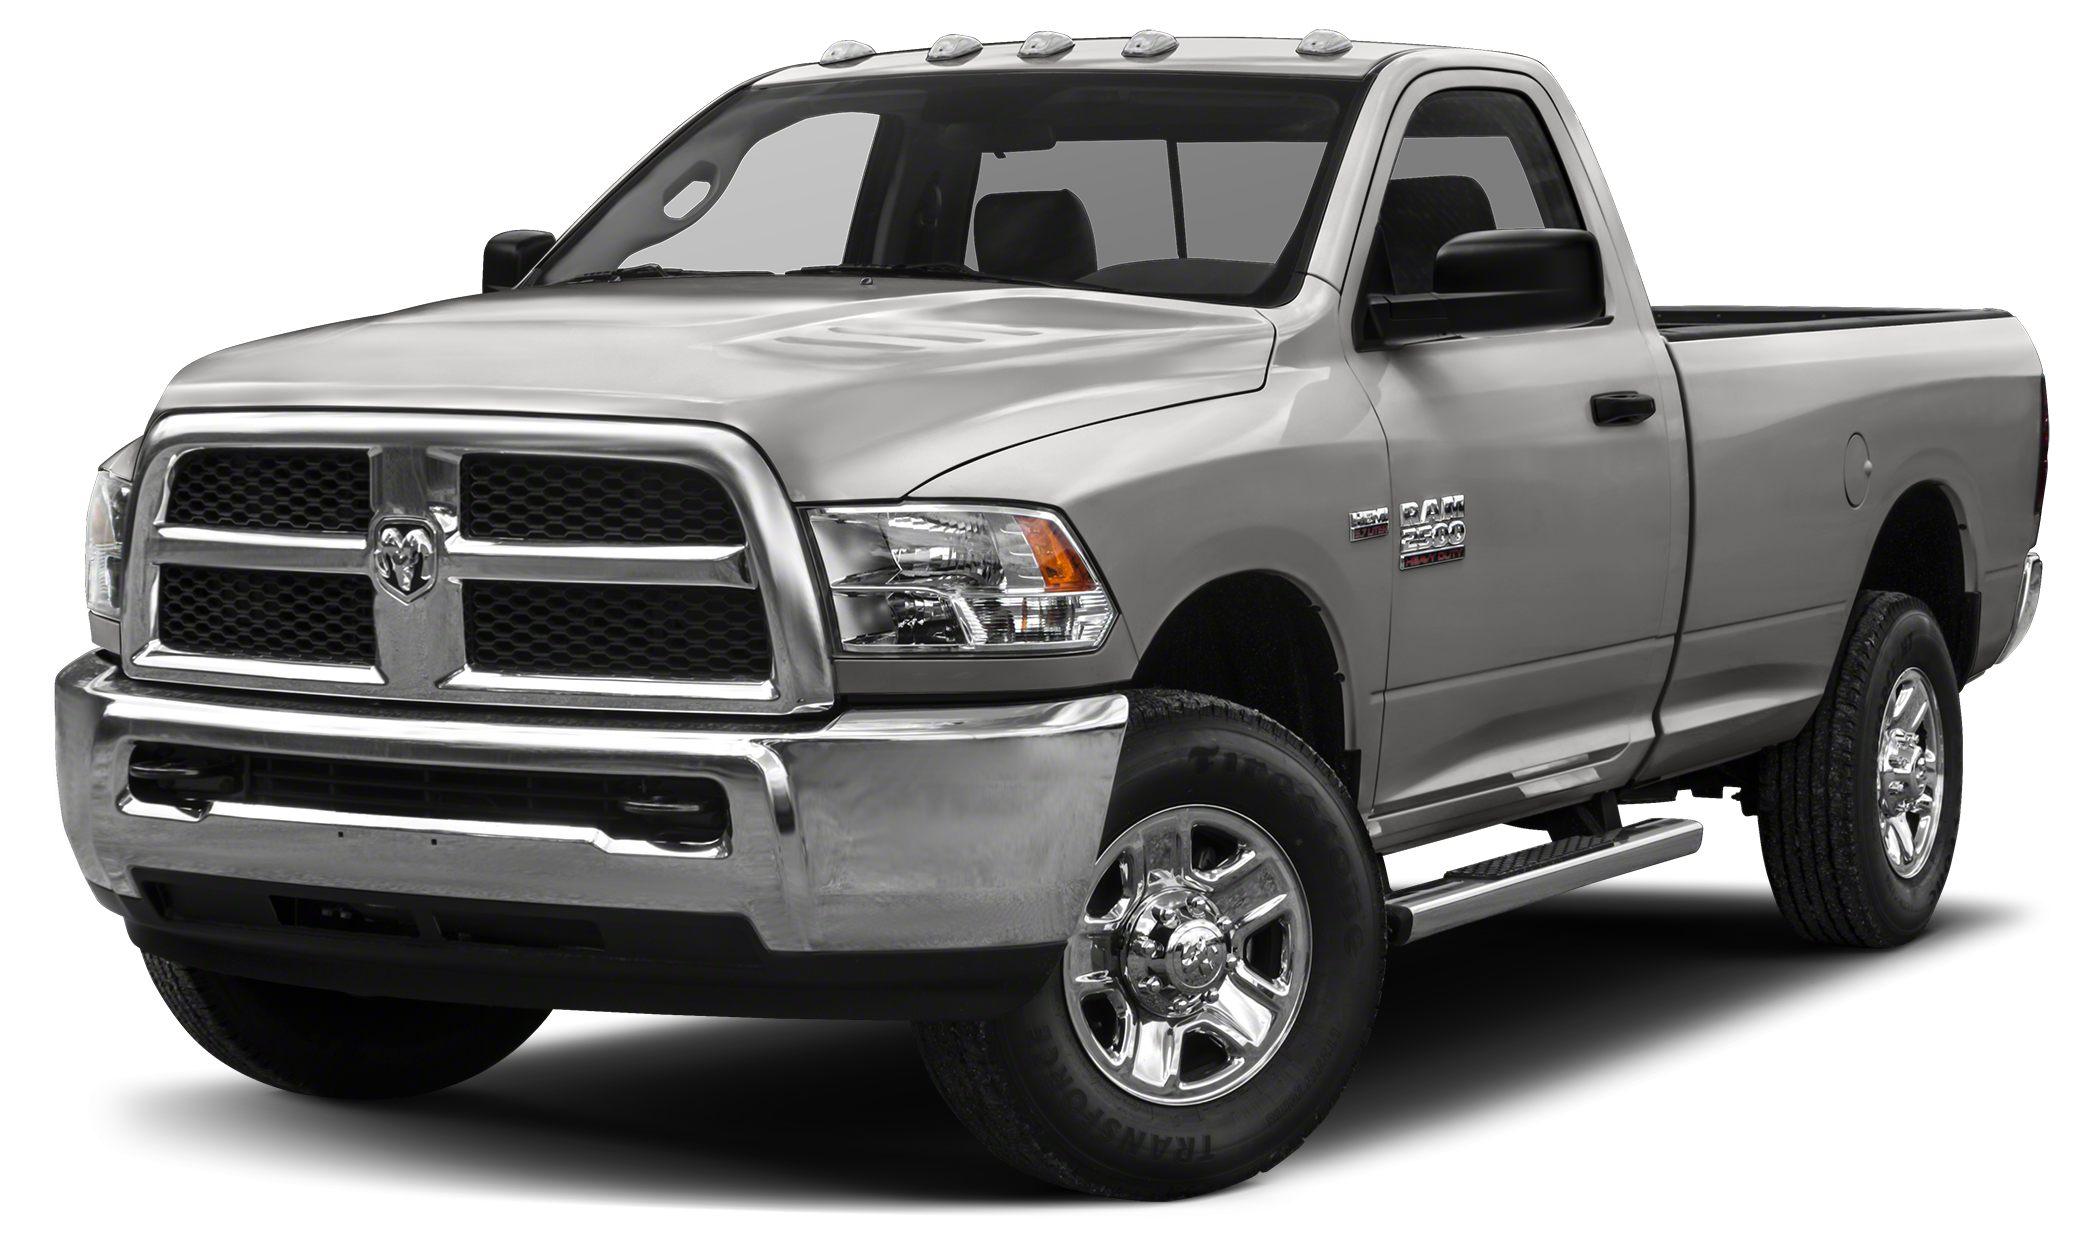 2016 RAM 2500 Tradesman Miles 18Color Bright Silver Metallic Clearcoat Stock 16R151 VIN 3C6M